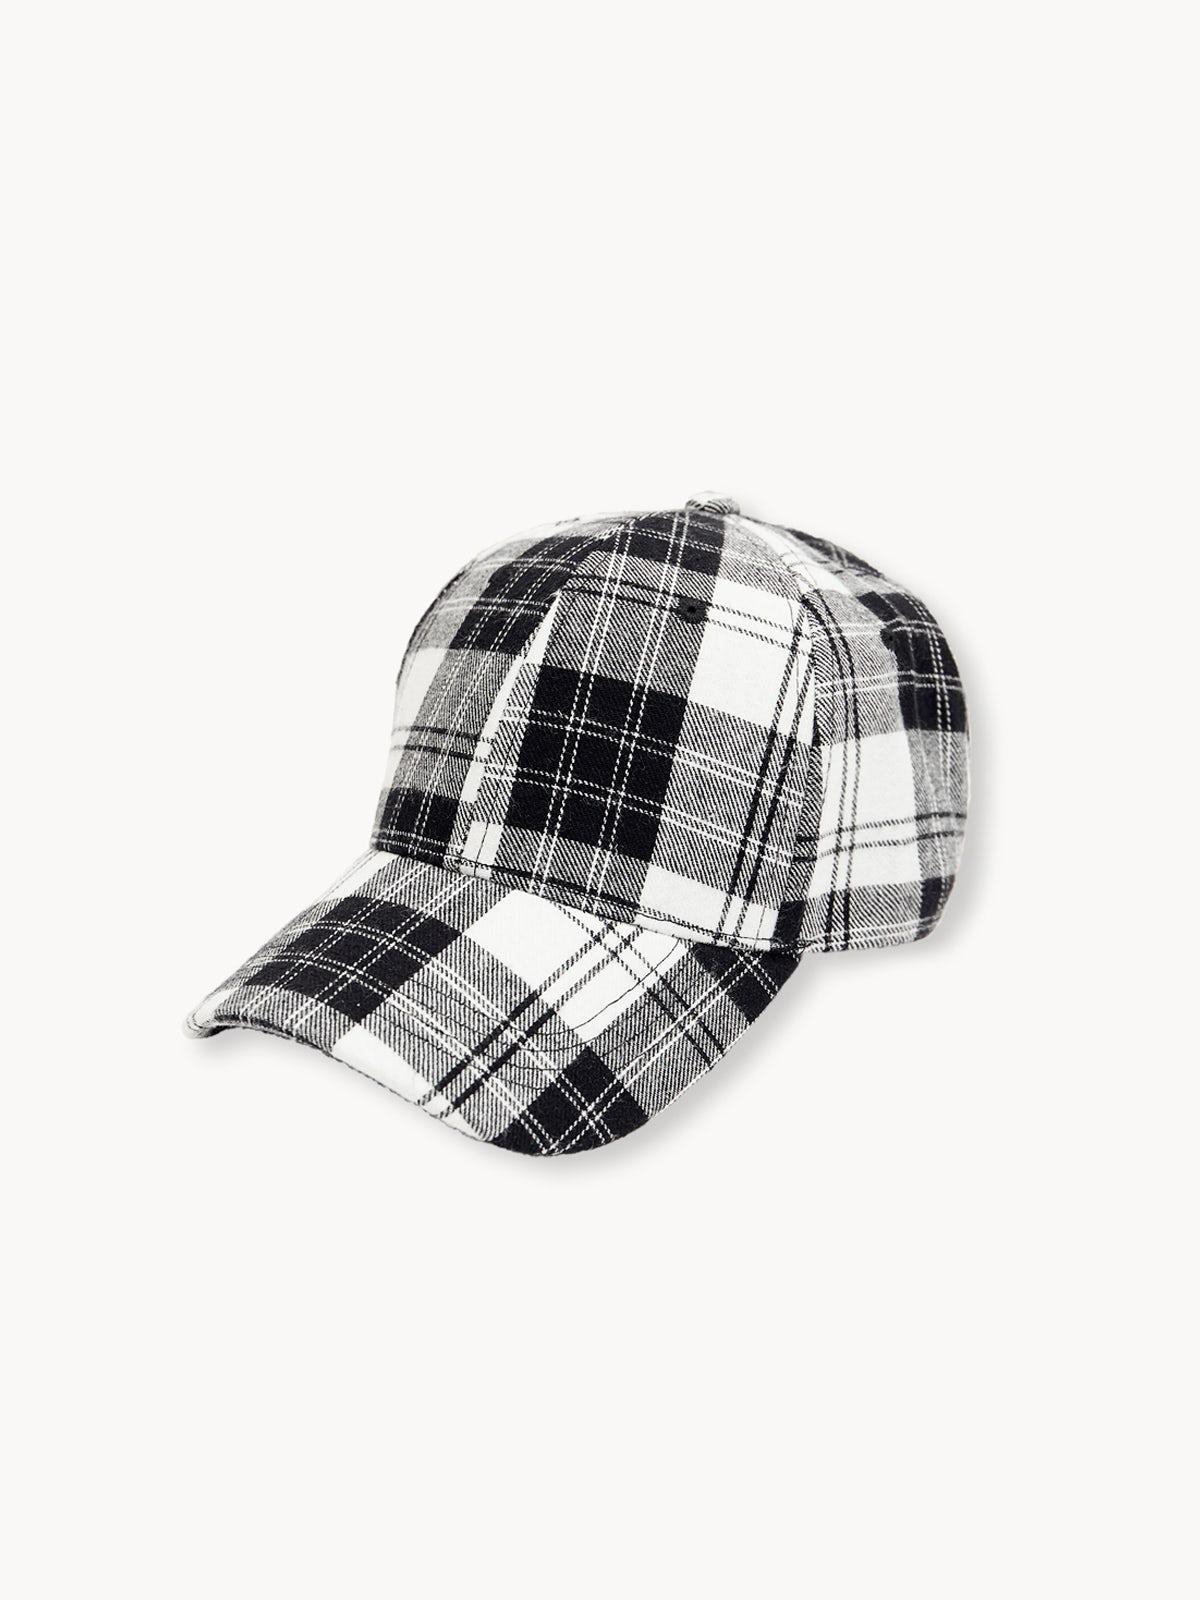 7a556dee462f6 Price  290 ฿  Name  Plaid Cap - Black White  icon